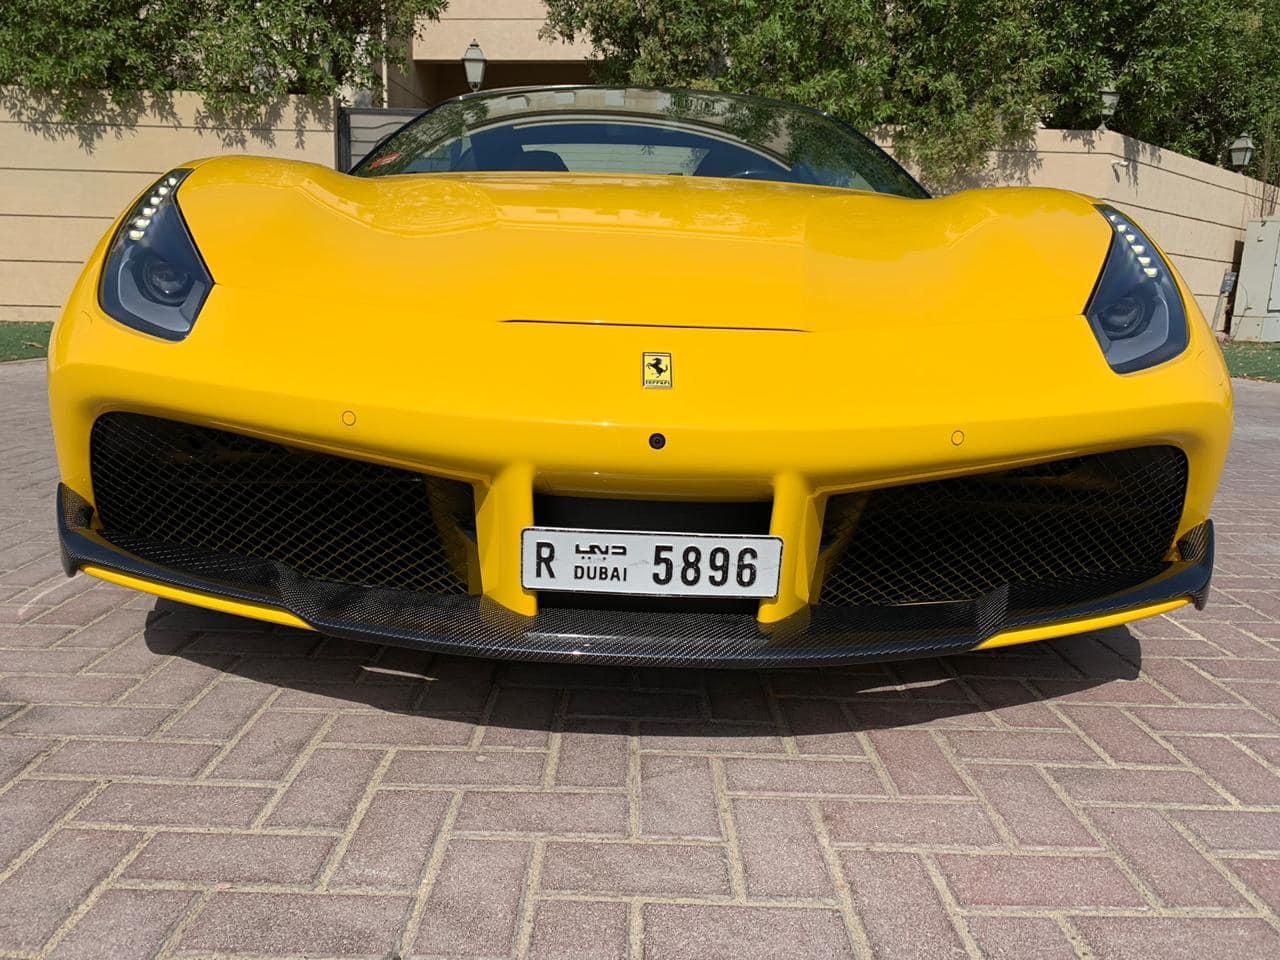 Siêu xe mui trần Ferrari